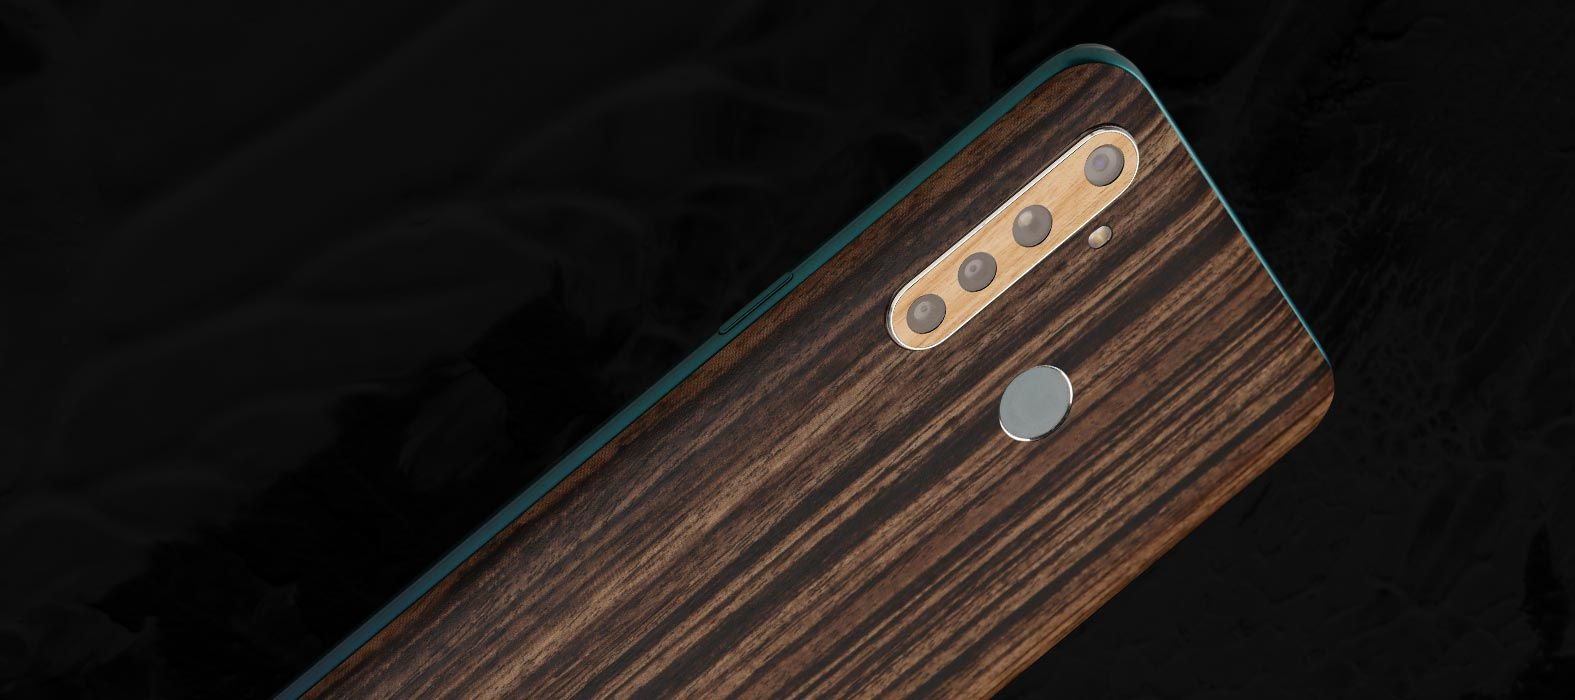 Realme 5 Pro Zebra wood skins